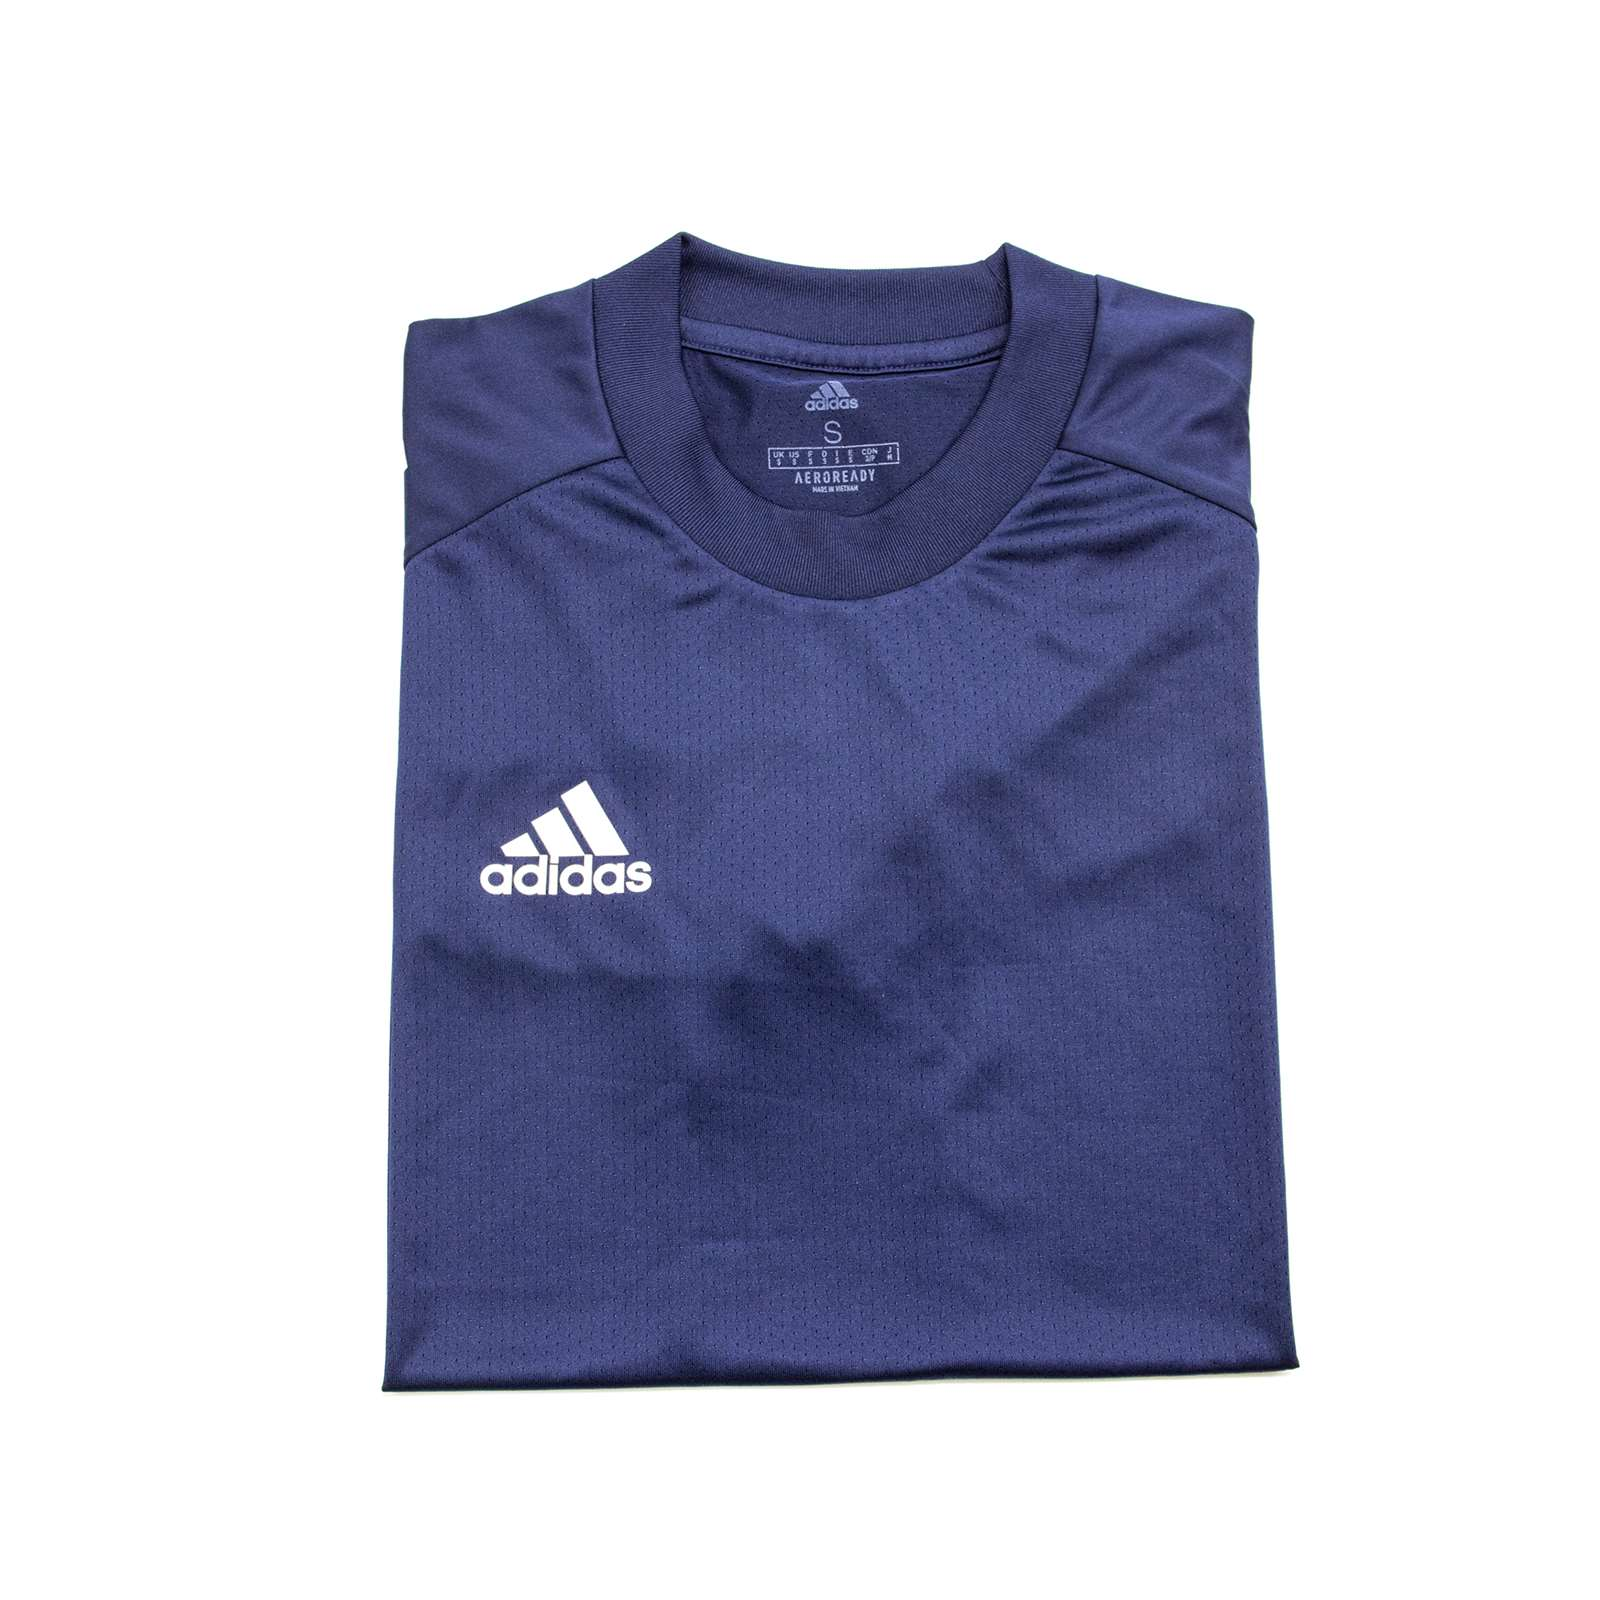 Adidas Men Condivo 20 Training Jersey - Walmart.com